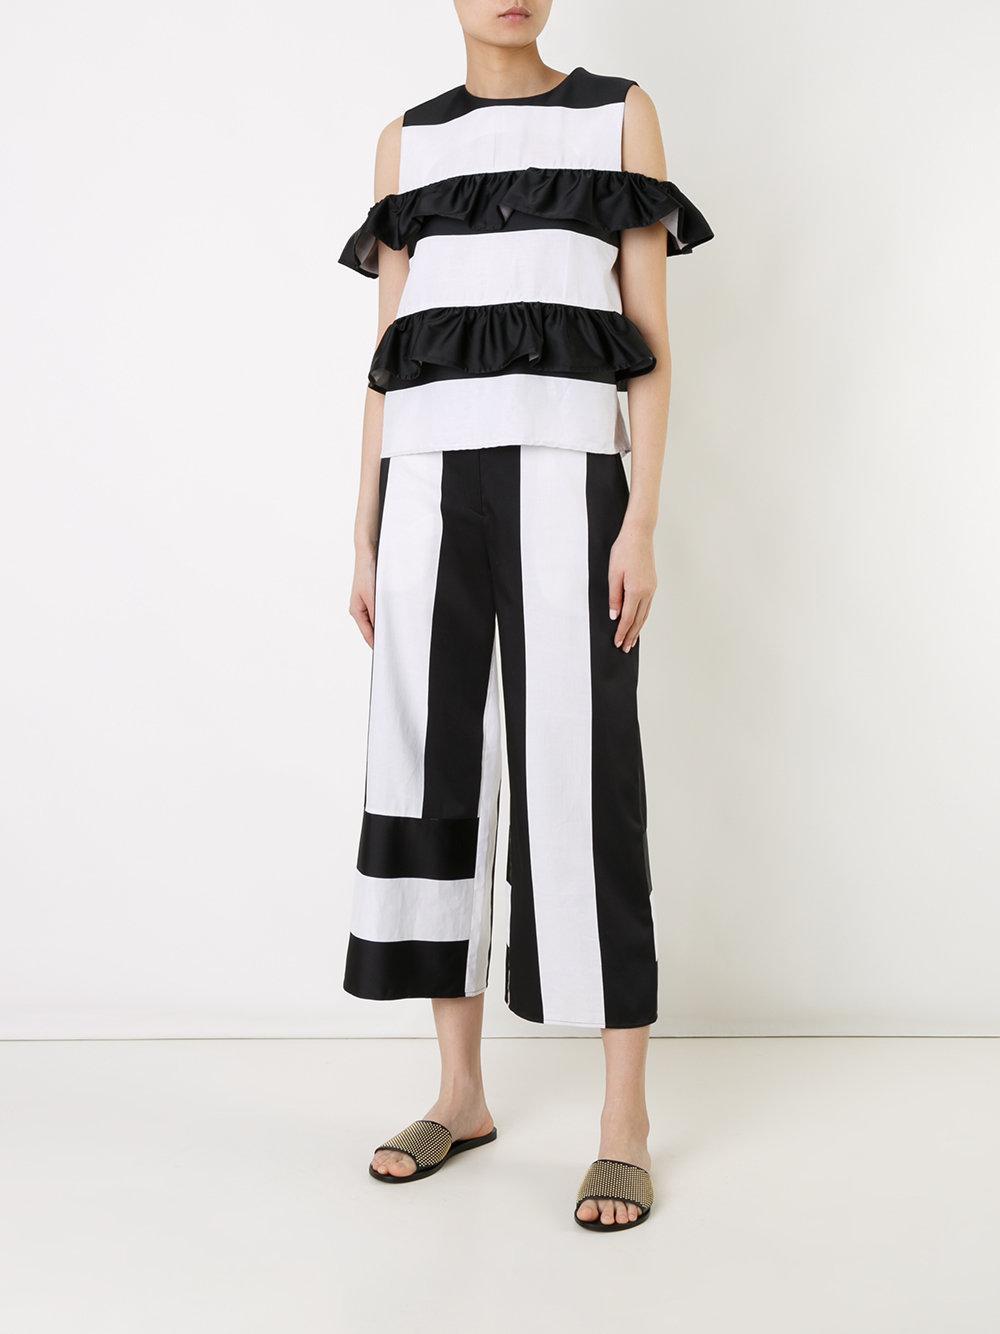 panel cropped trousers - White GOEN.J UIiJ7QSw1g